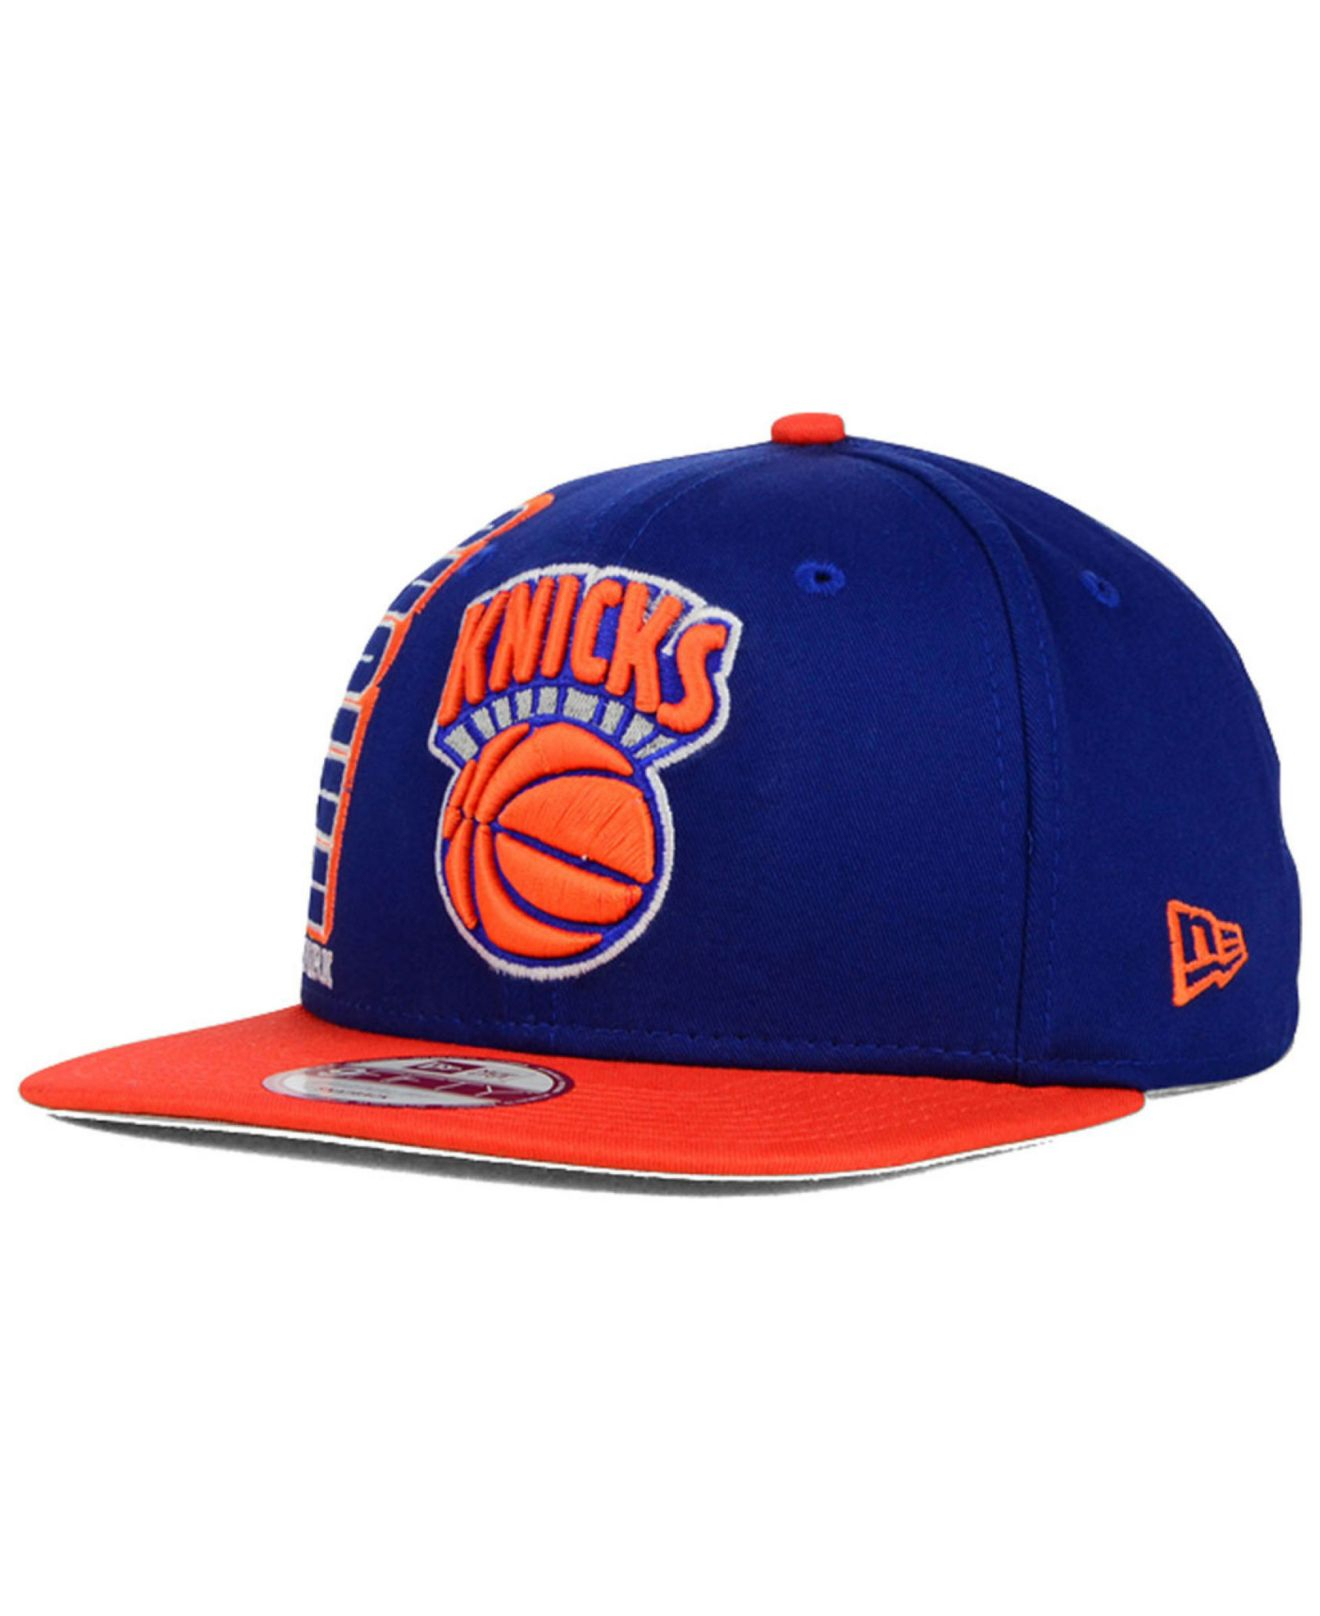 0738cf9c5f9 Lyst - KTZ New York Knicks Rally Mark 9fifty Snapback Cap in Blue ...